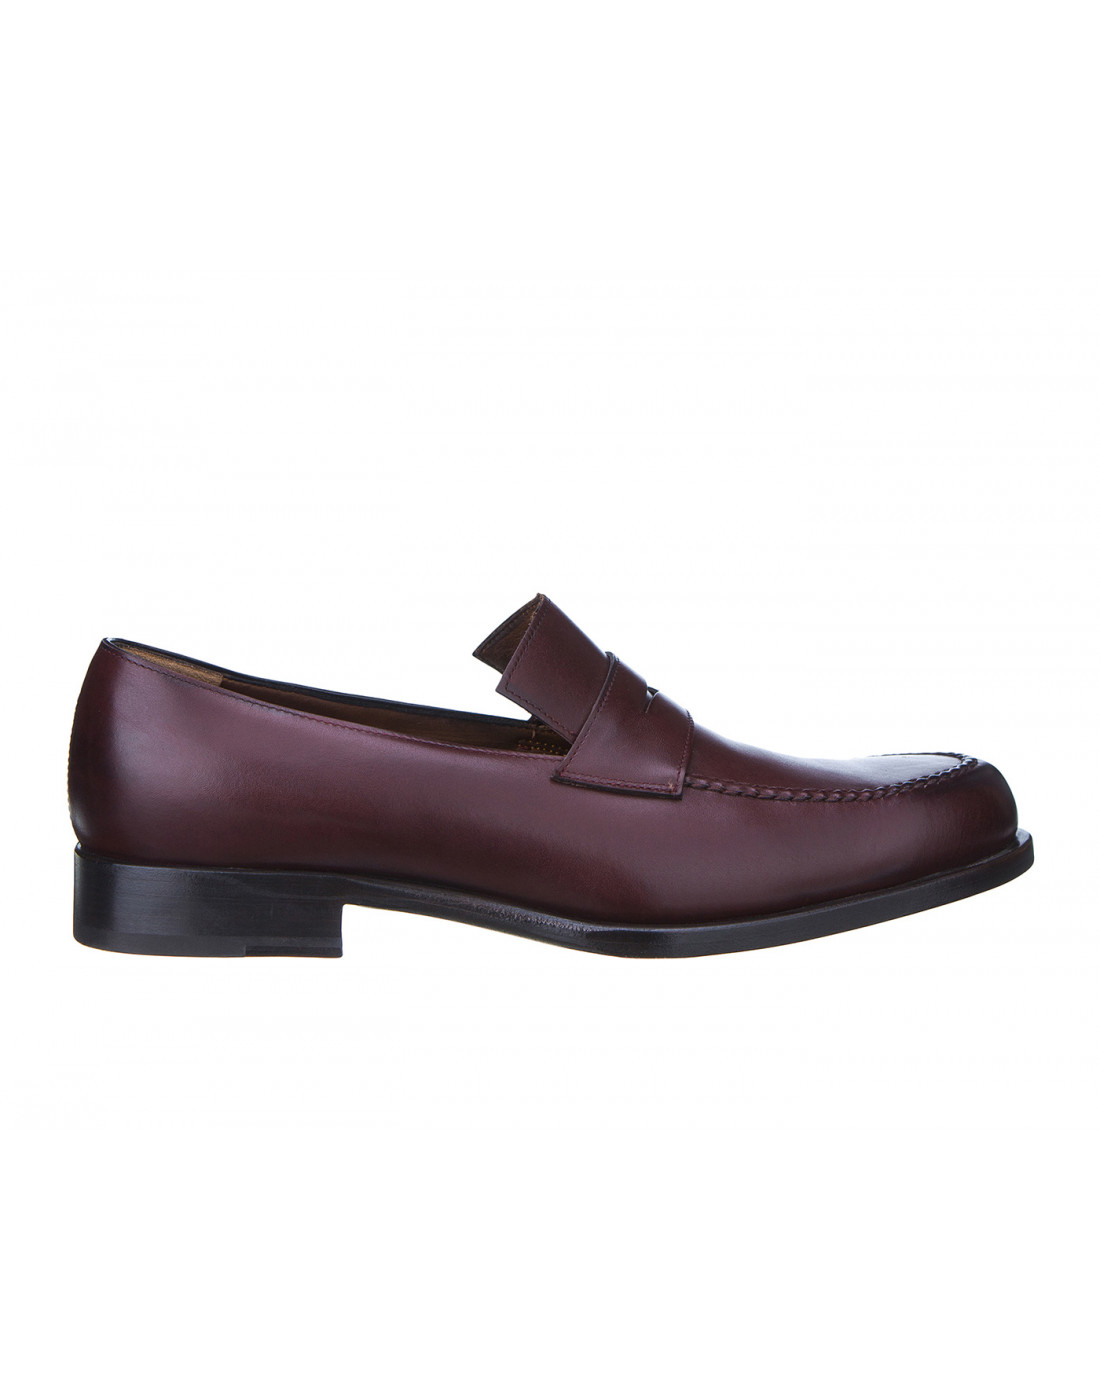 Туфли коричневые мужские Fratelli Rossetti S12597-1